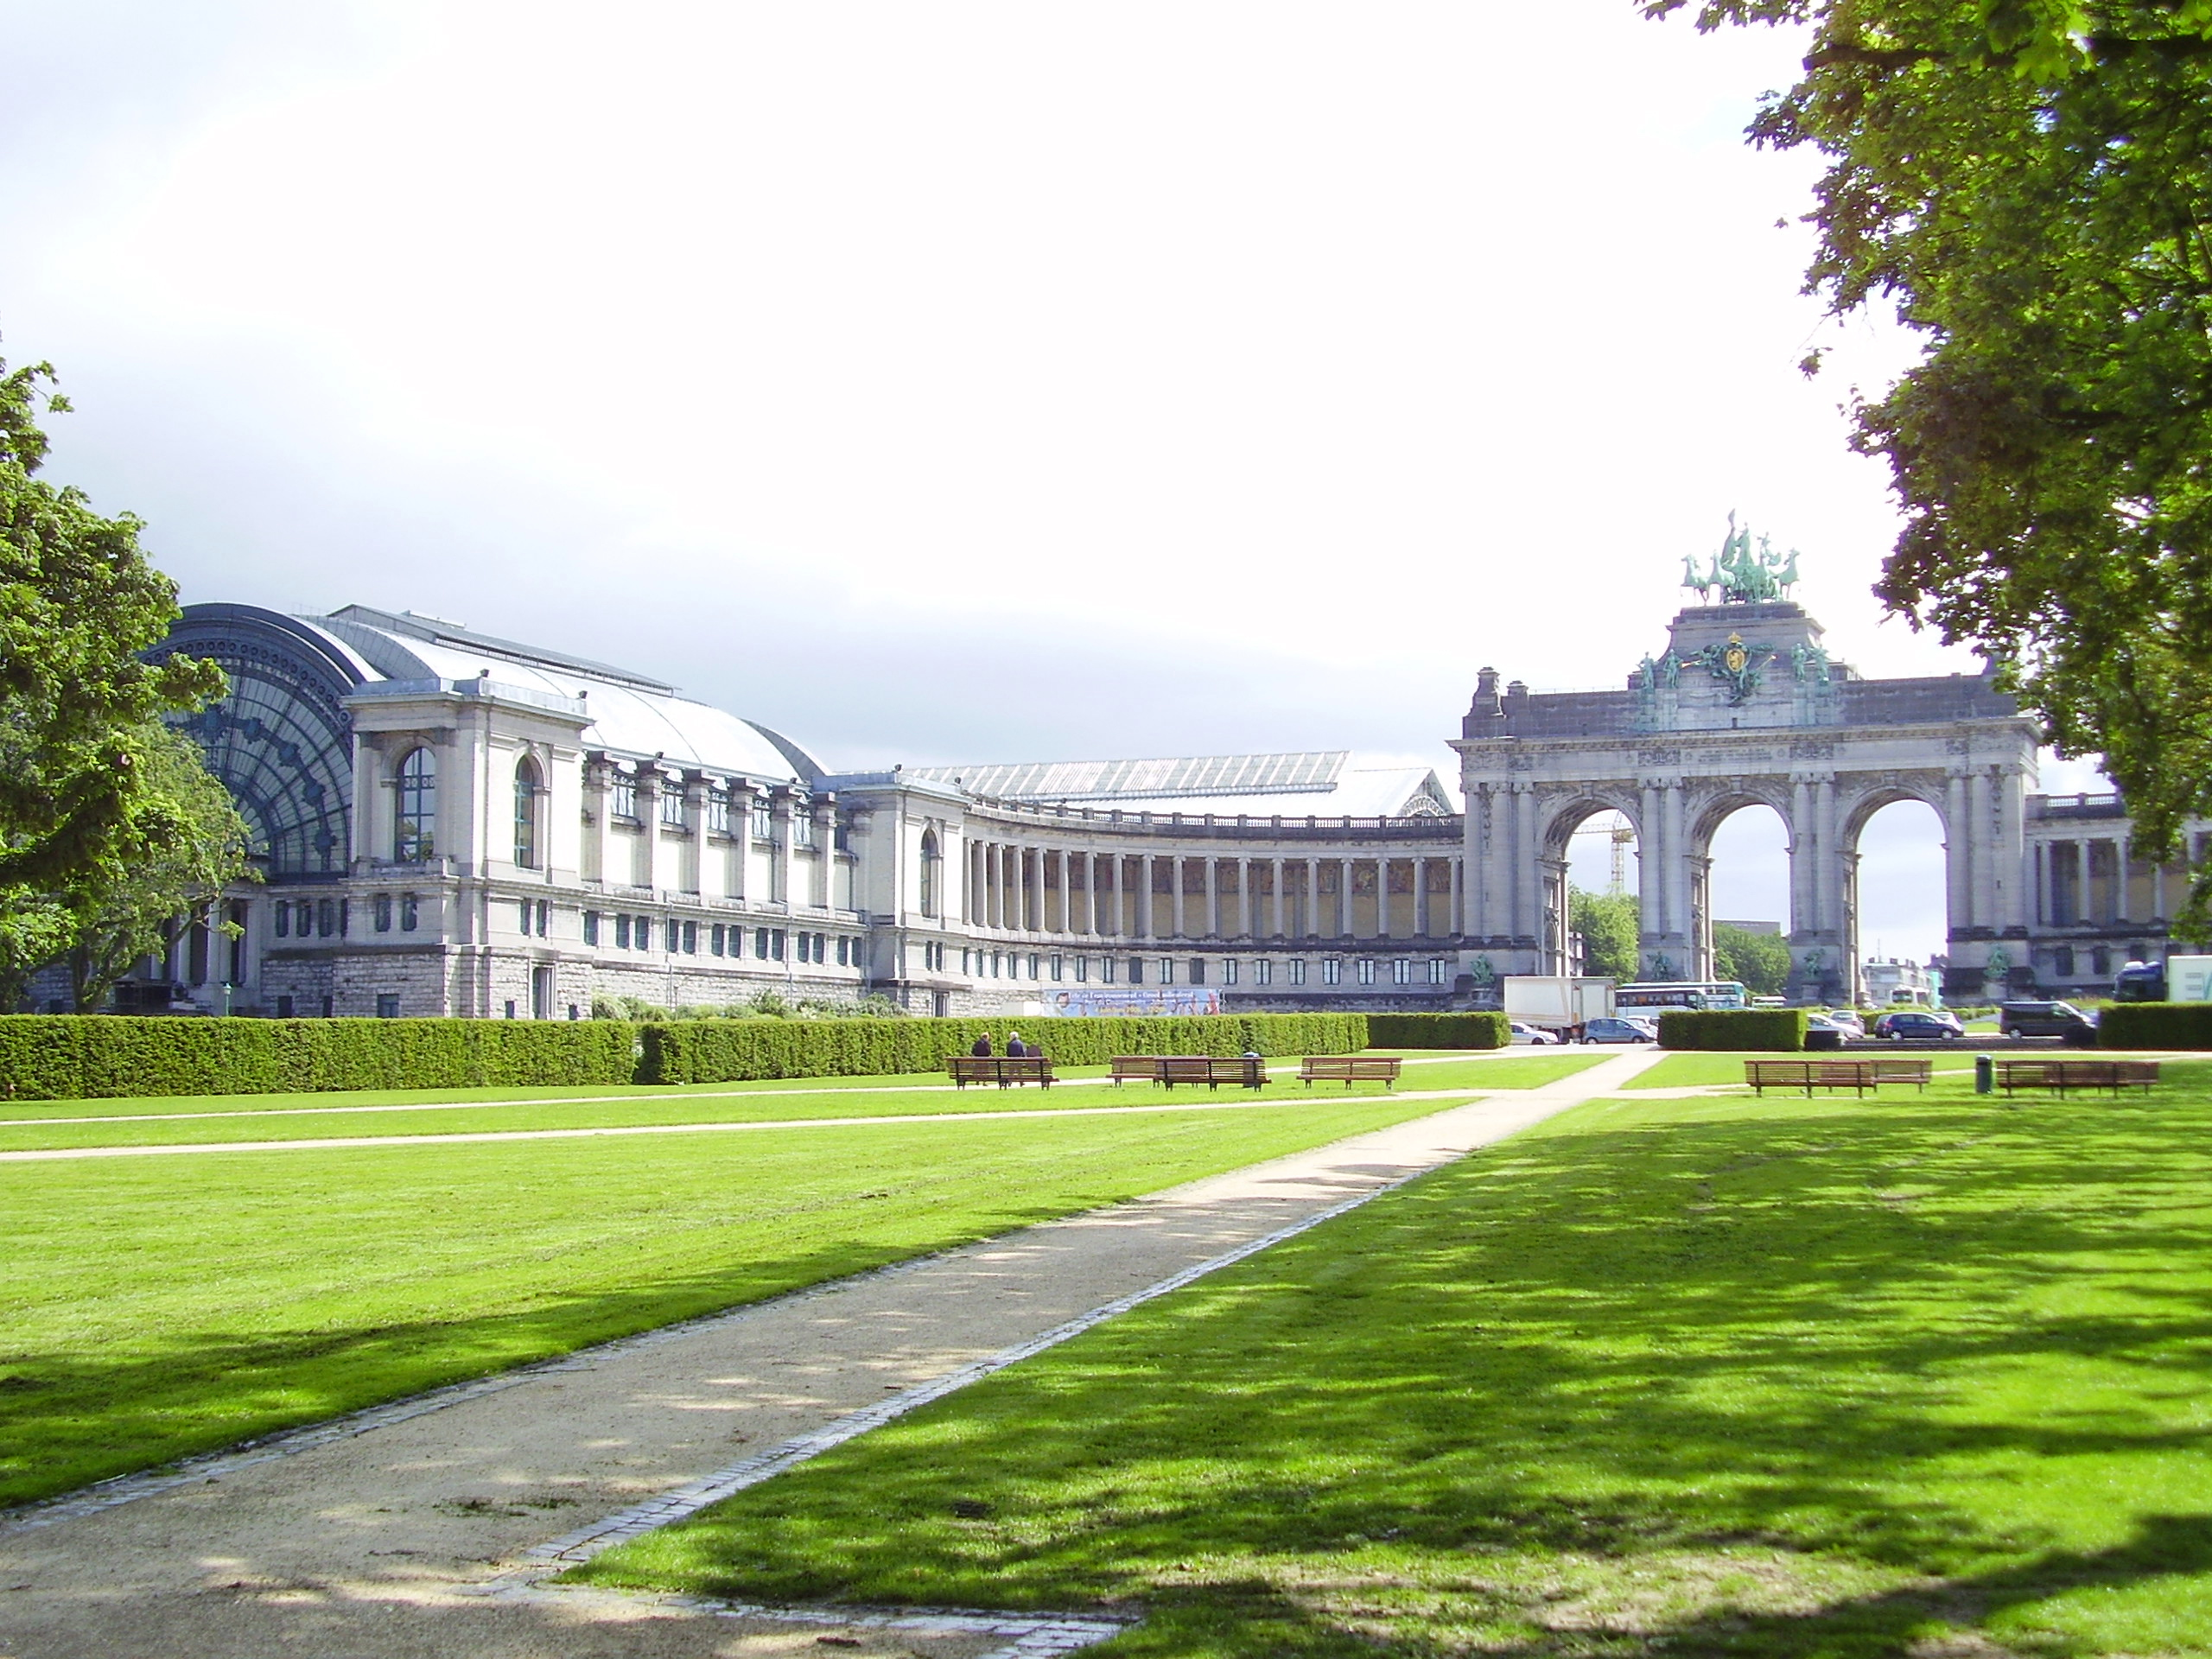 Cinquantenaire or Jubelpark